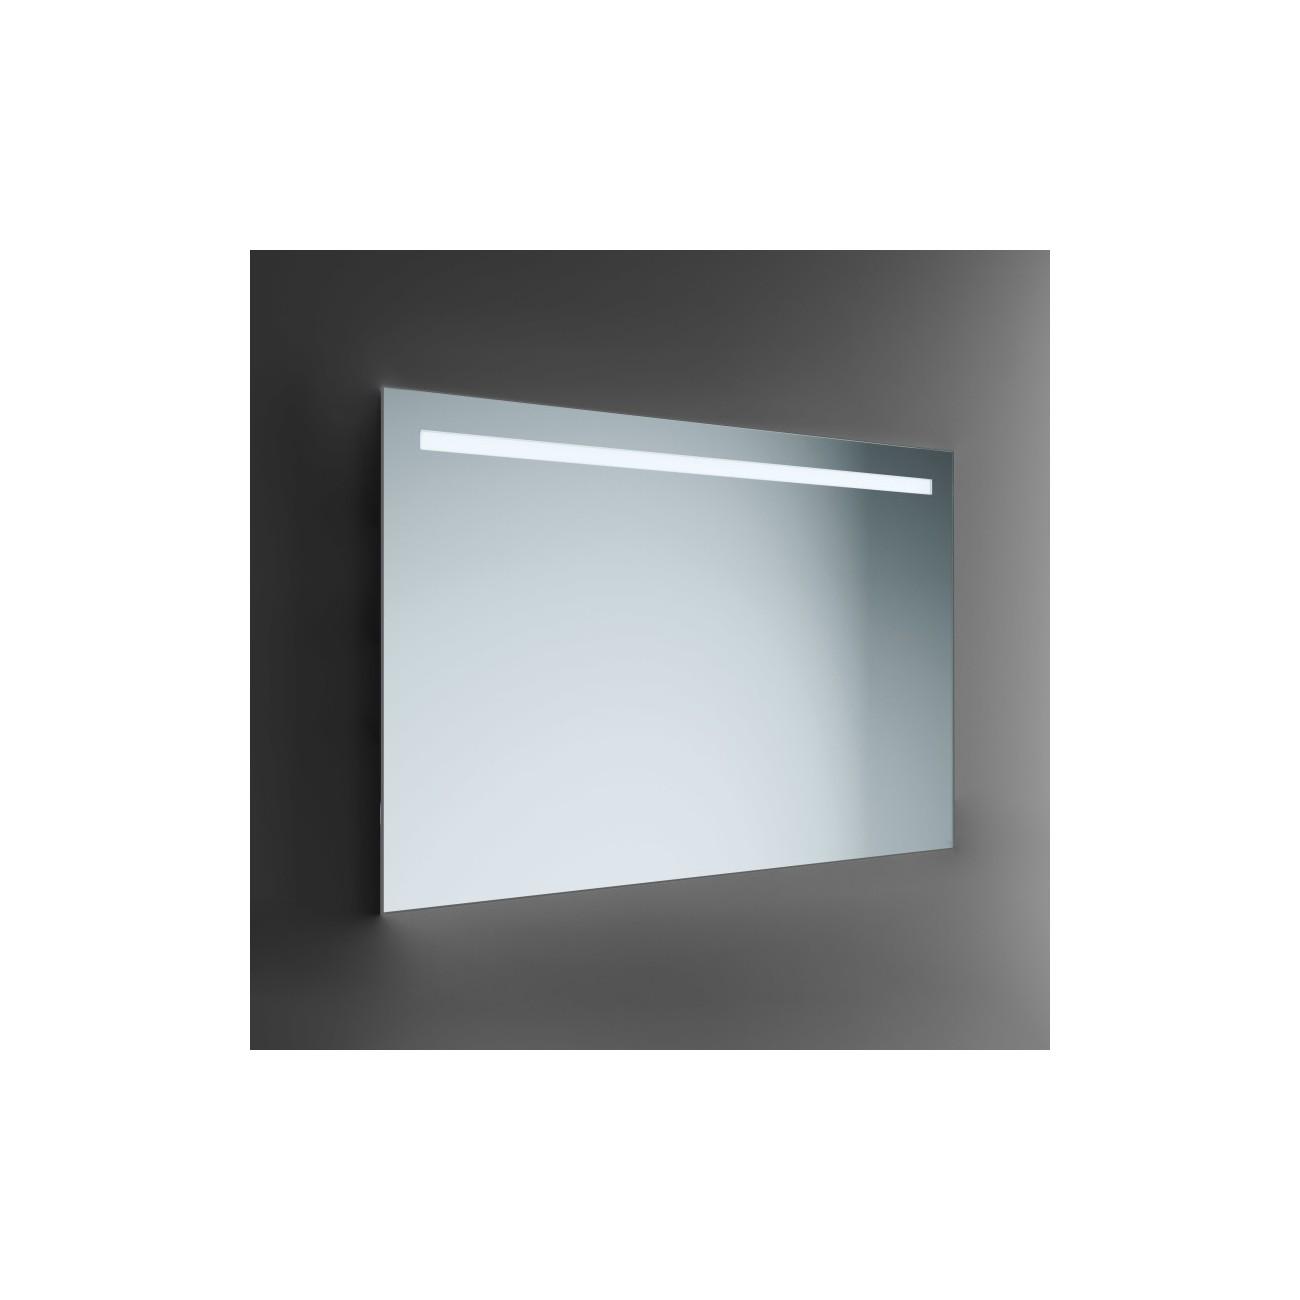 Lineabeta Speci Espejos con luz frontal